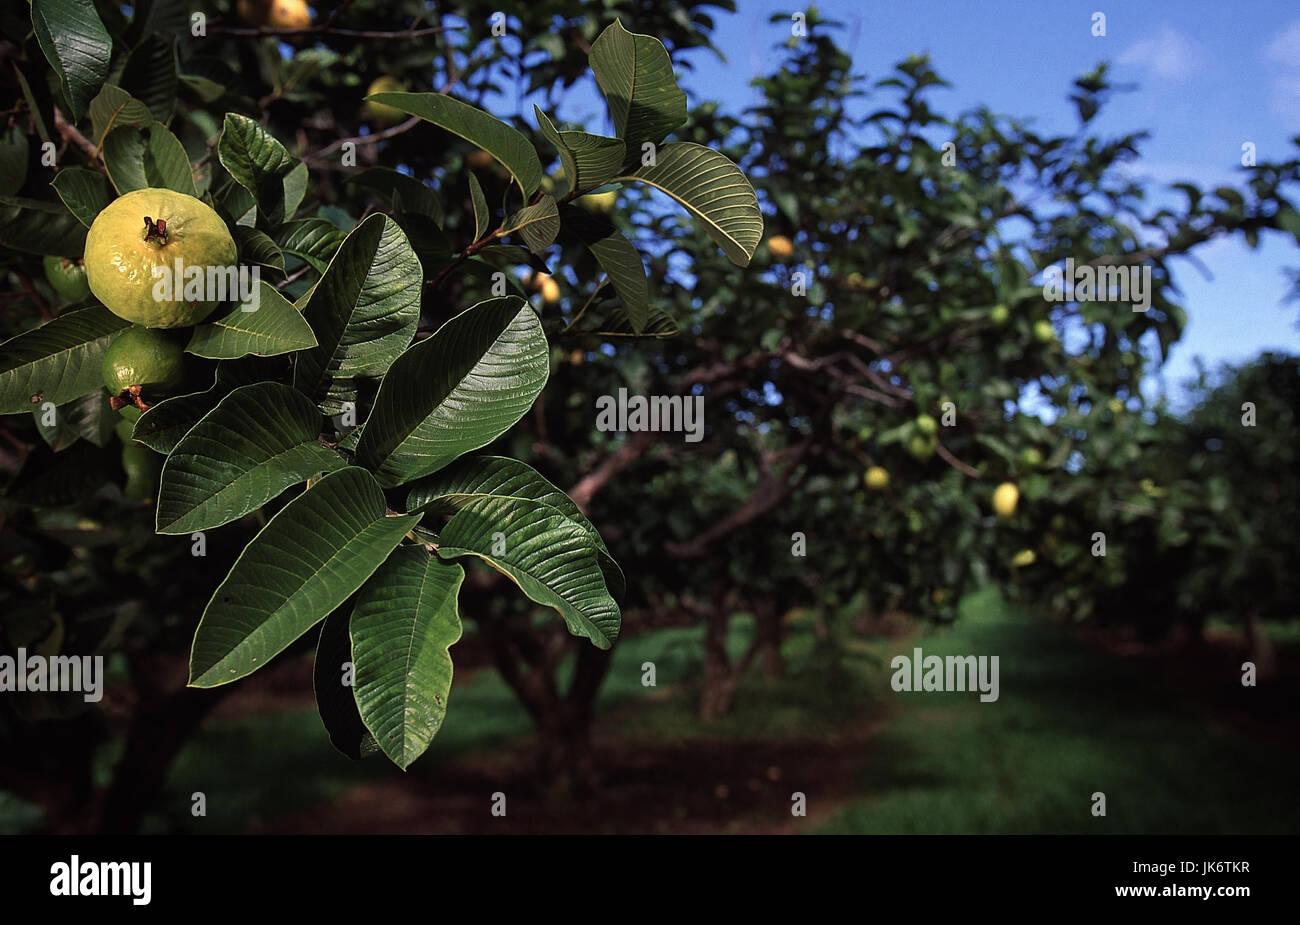 USA, Hawaii, Kauai, Kilauea,  Plantage, Anbau, Guave, Psidium guajava  Insel, Landwirtschaft, Wirtschaft, Guava - Stock Image